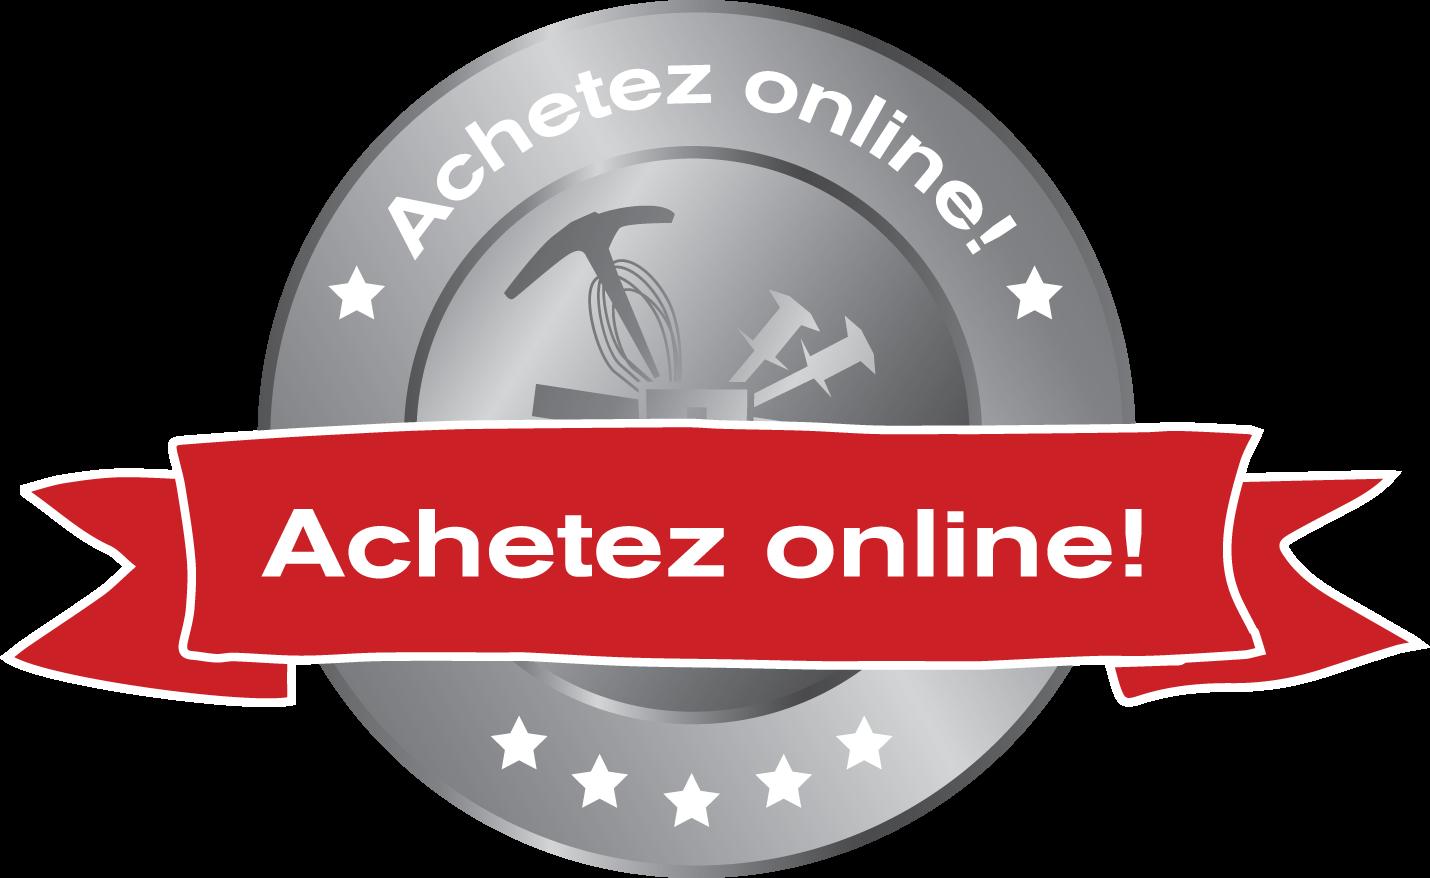 Skipass achetez online Saas-Fee